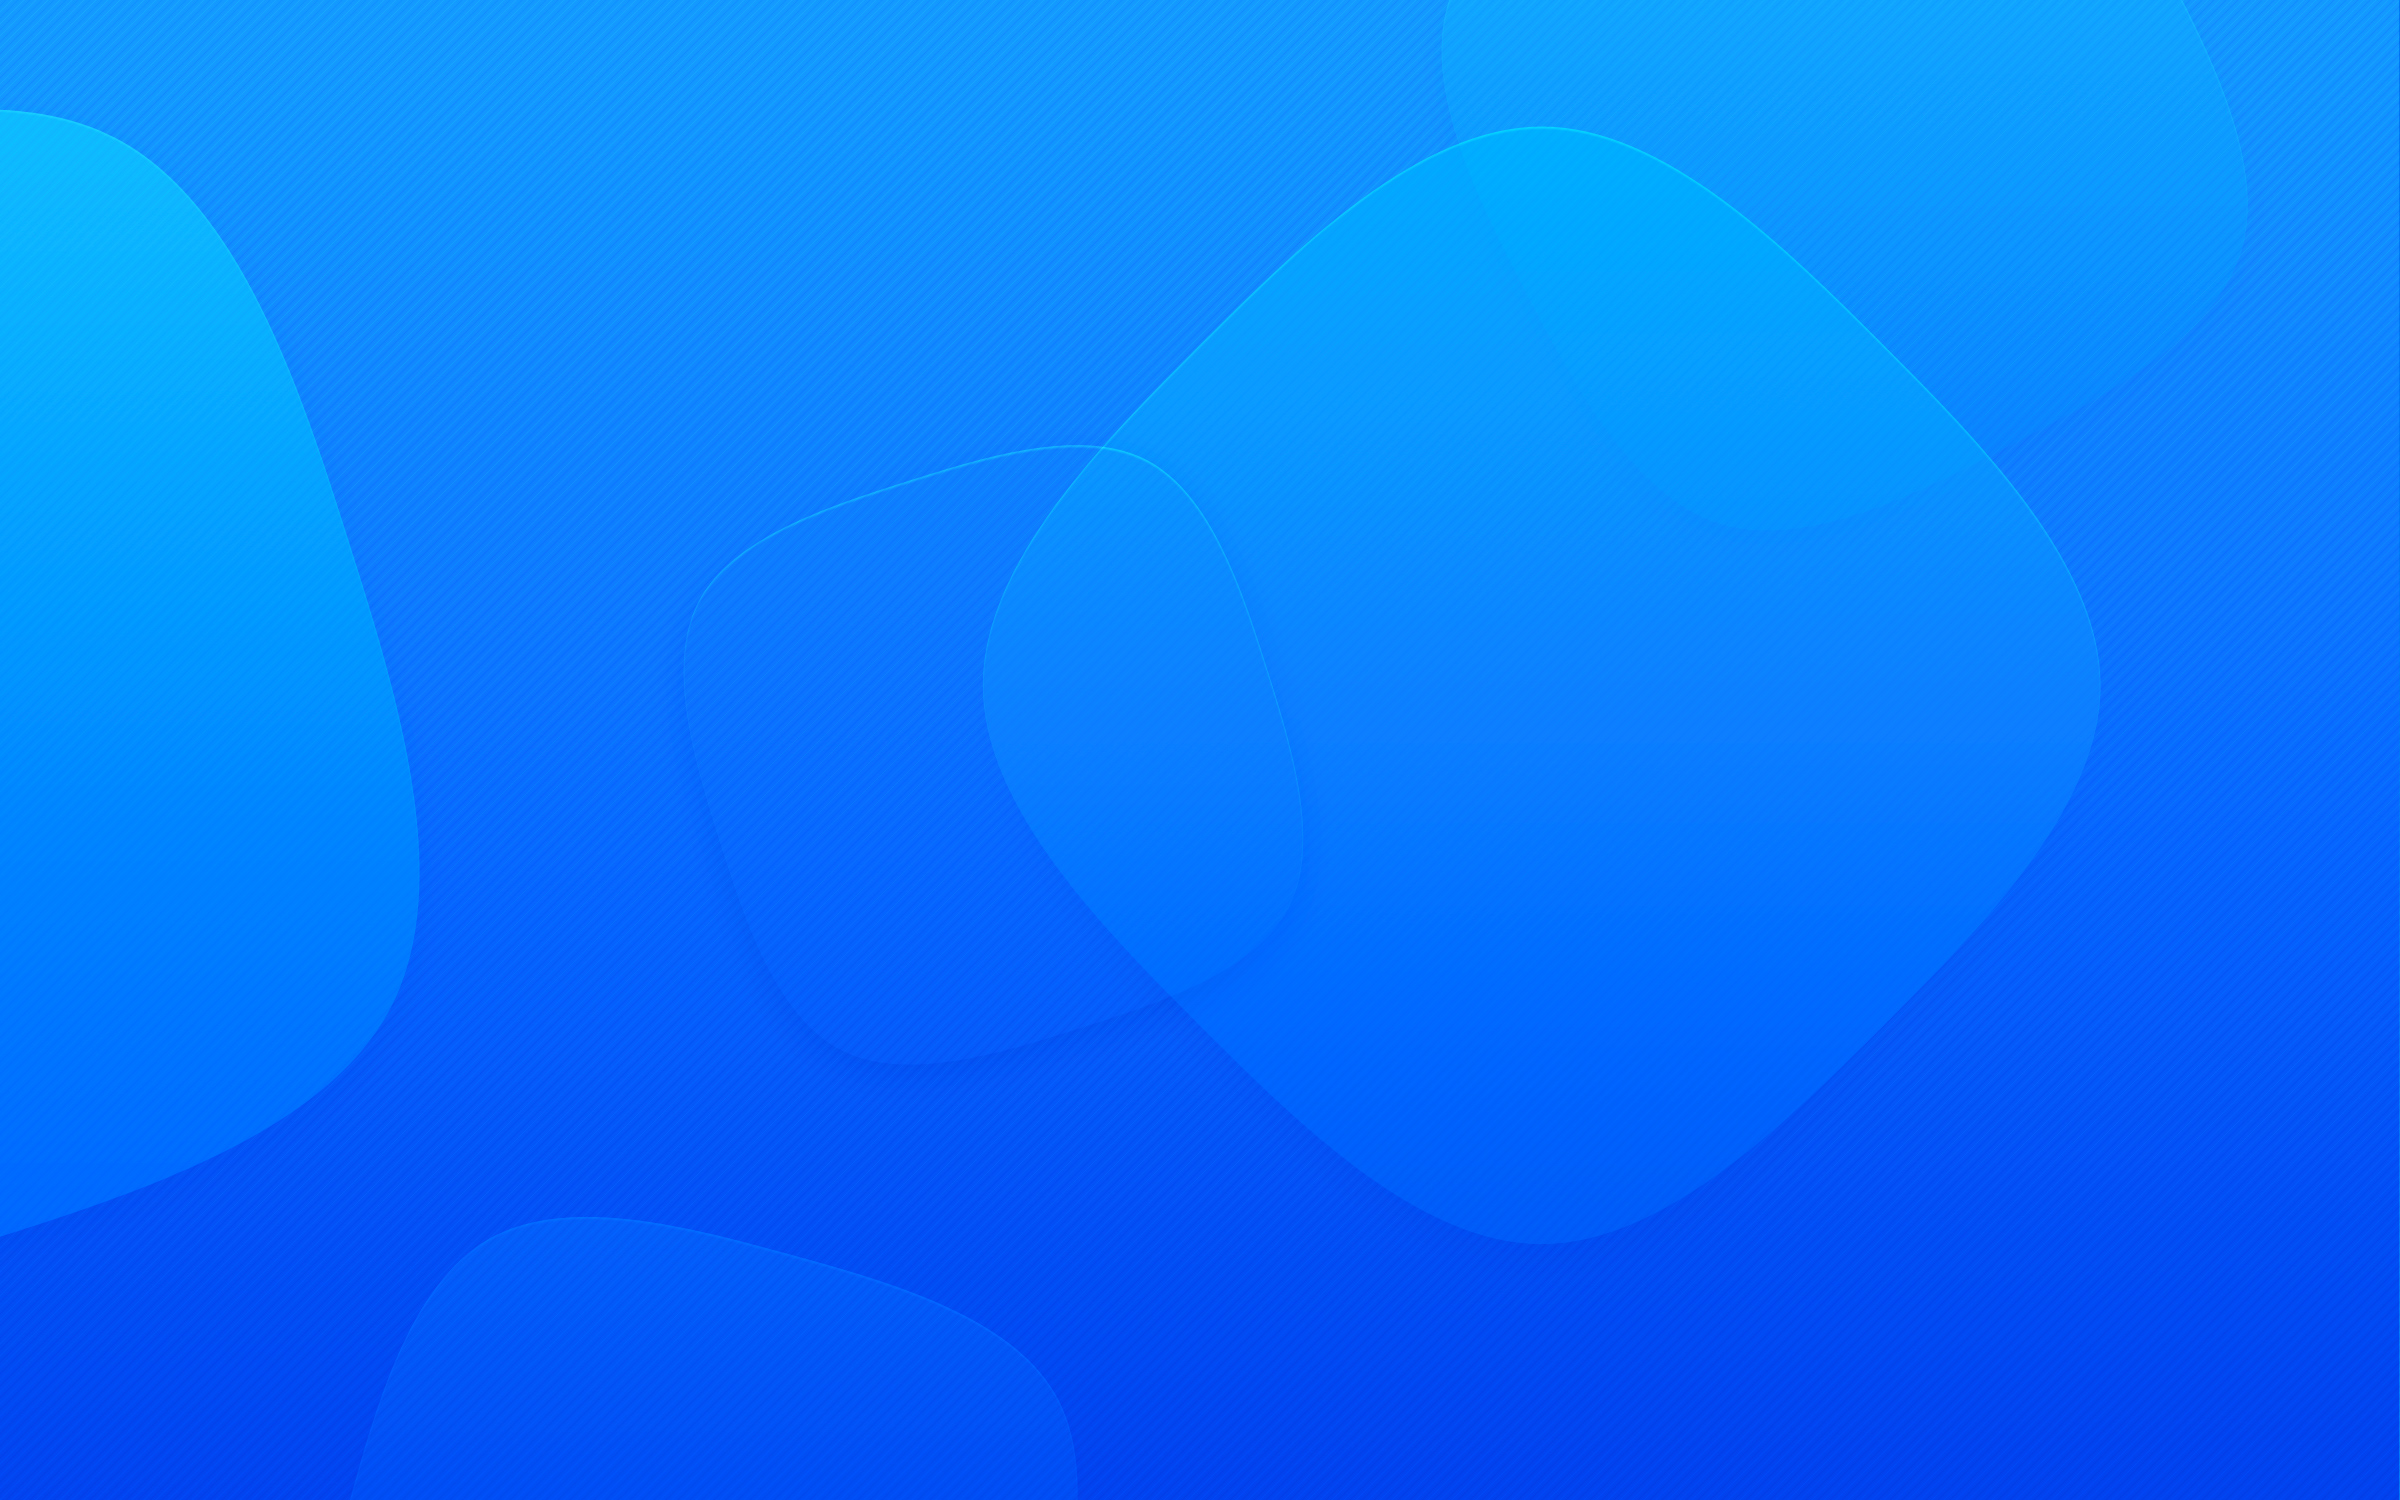 Perfect Blue Wallpaper Download High Resolution 4k Wallpaper